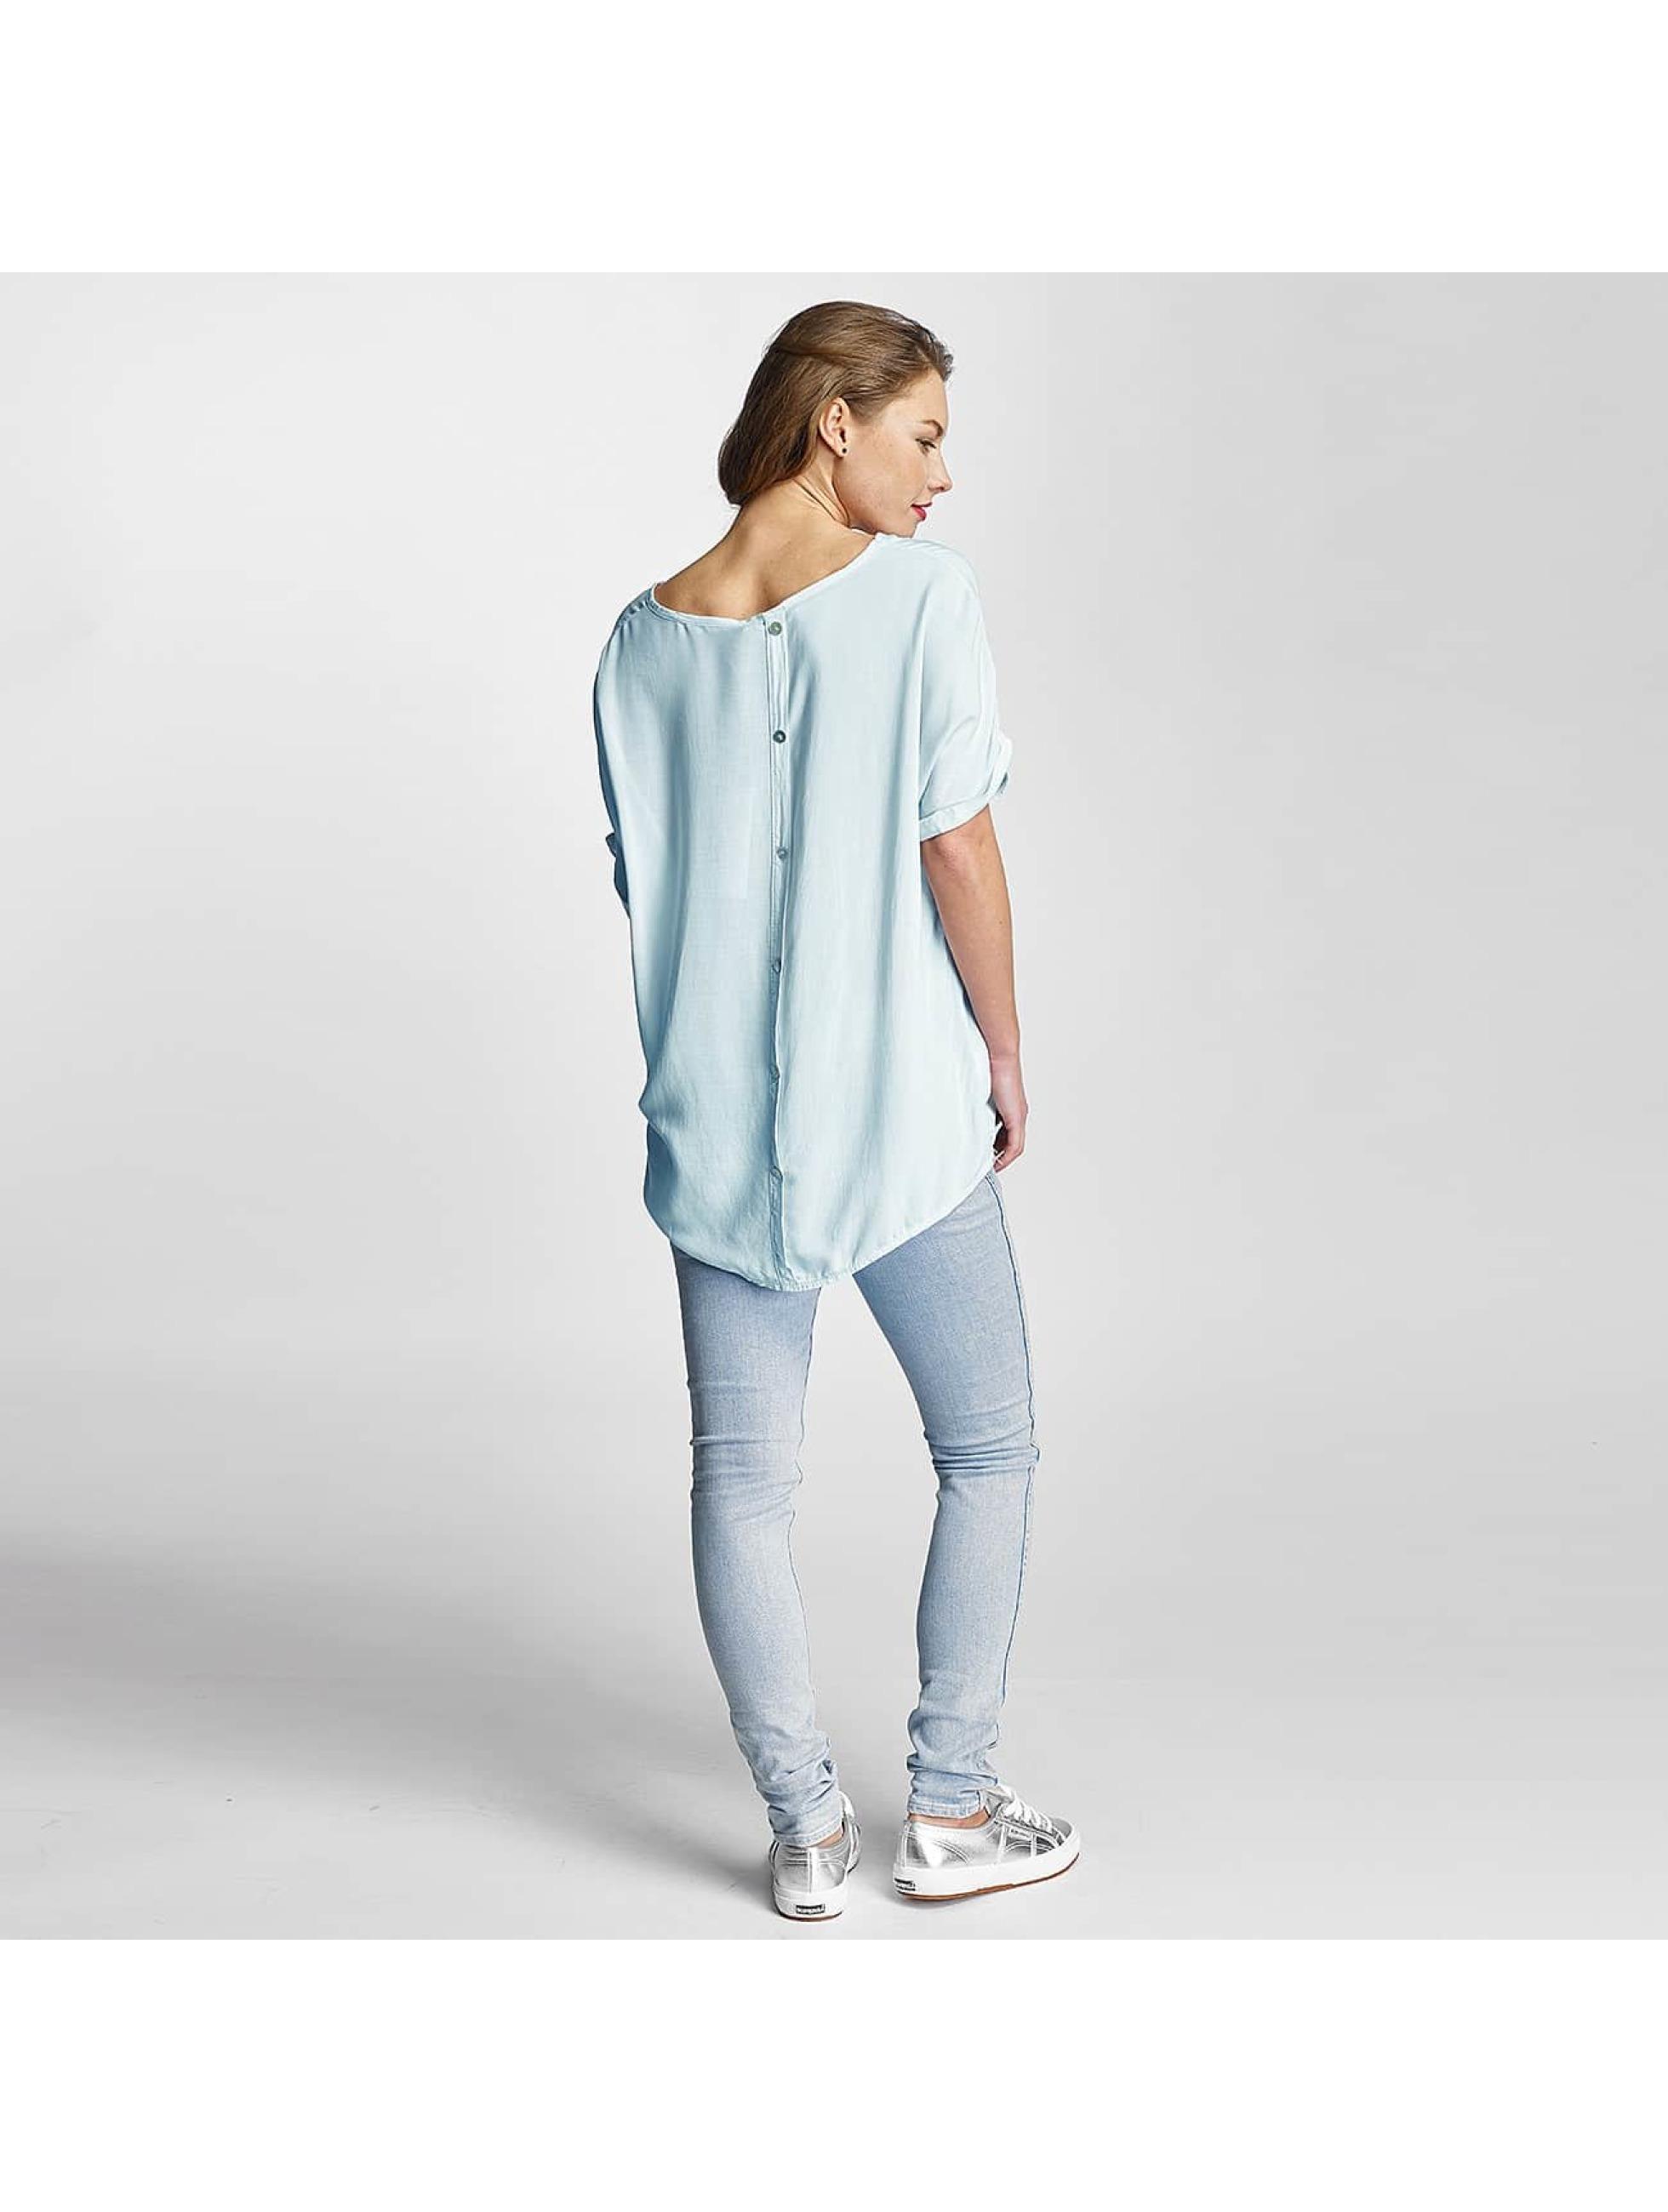 Poolgirl Bluser/Tunikaer Simplicity blå